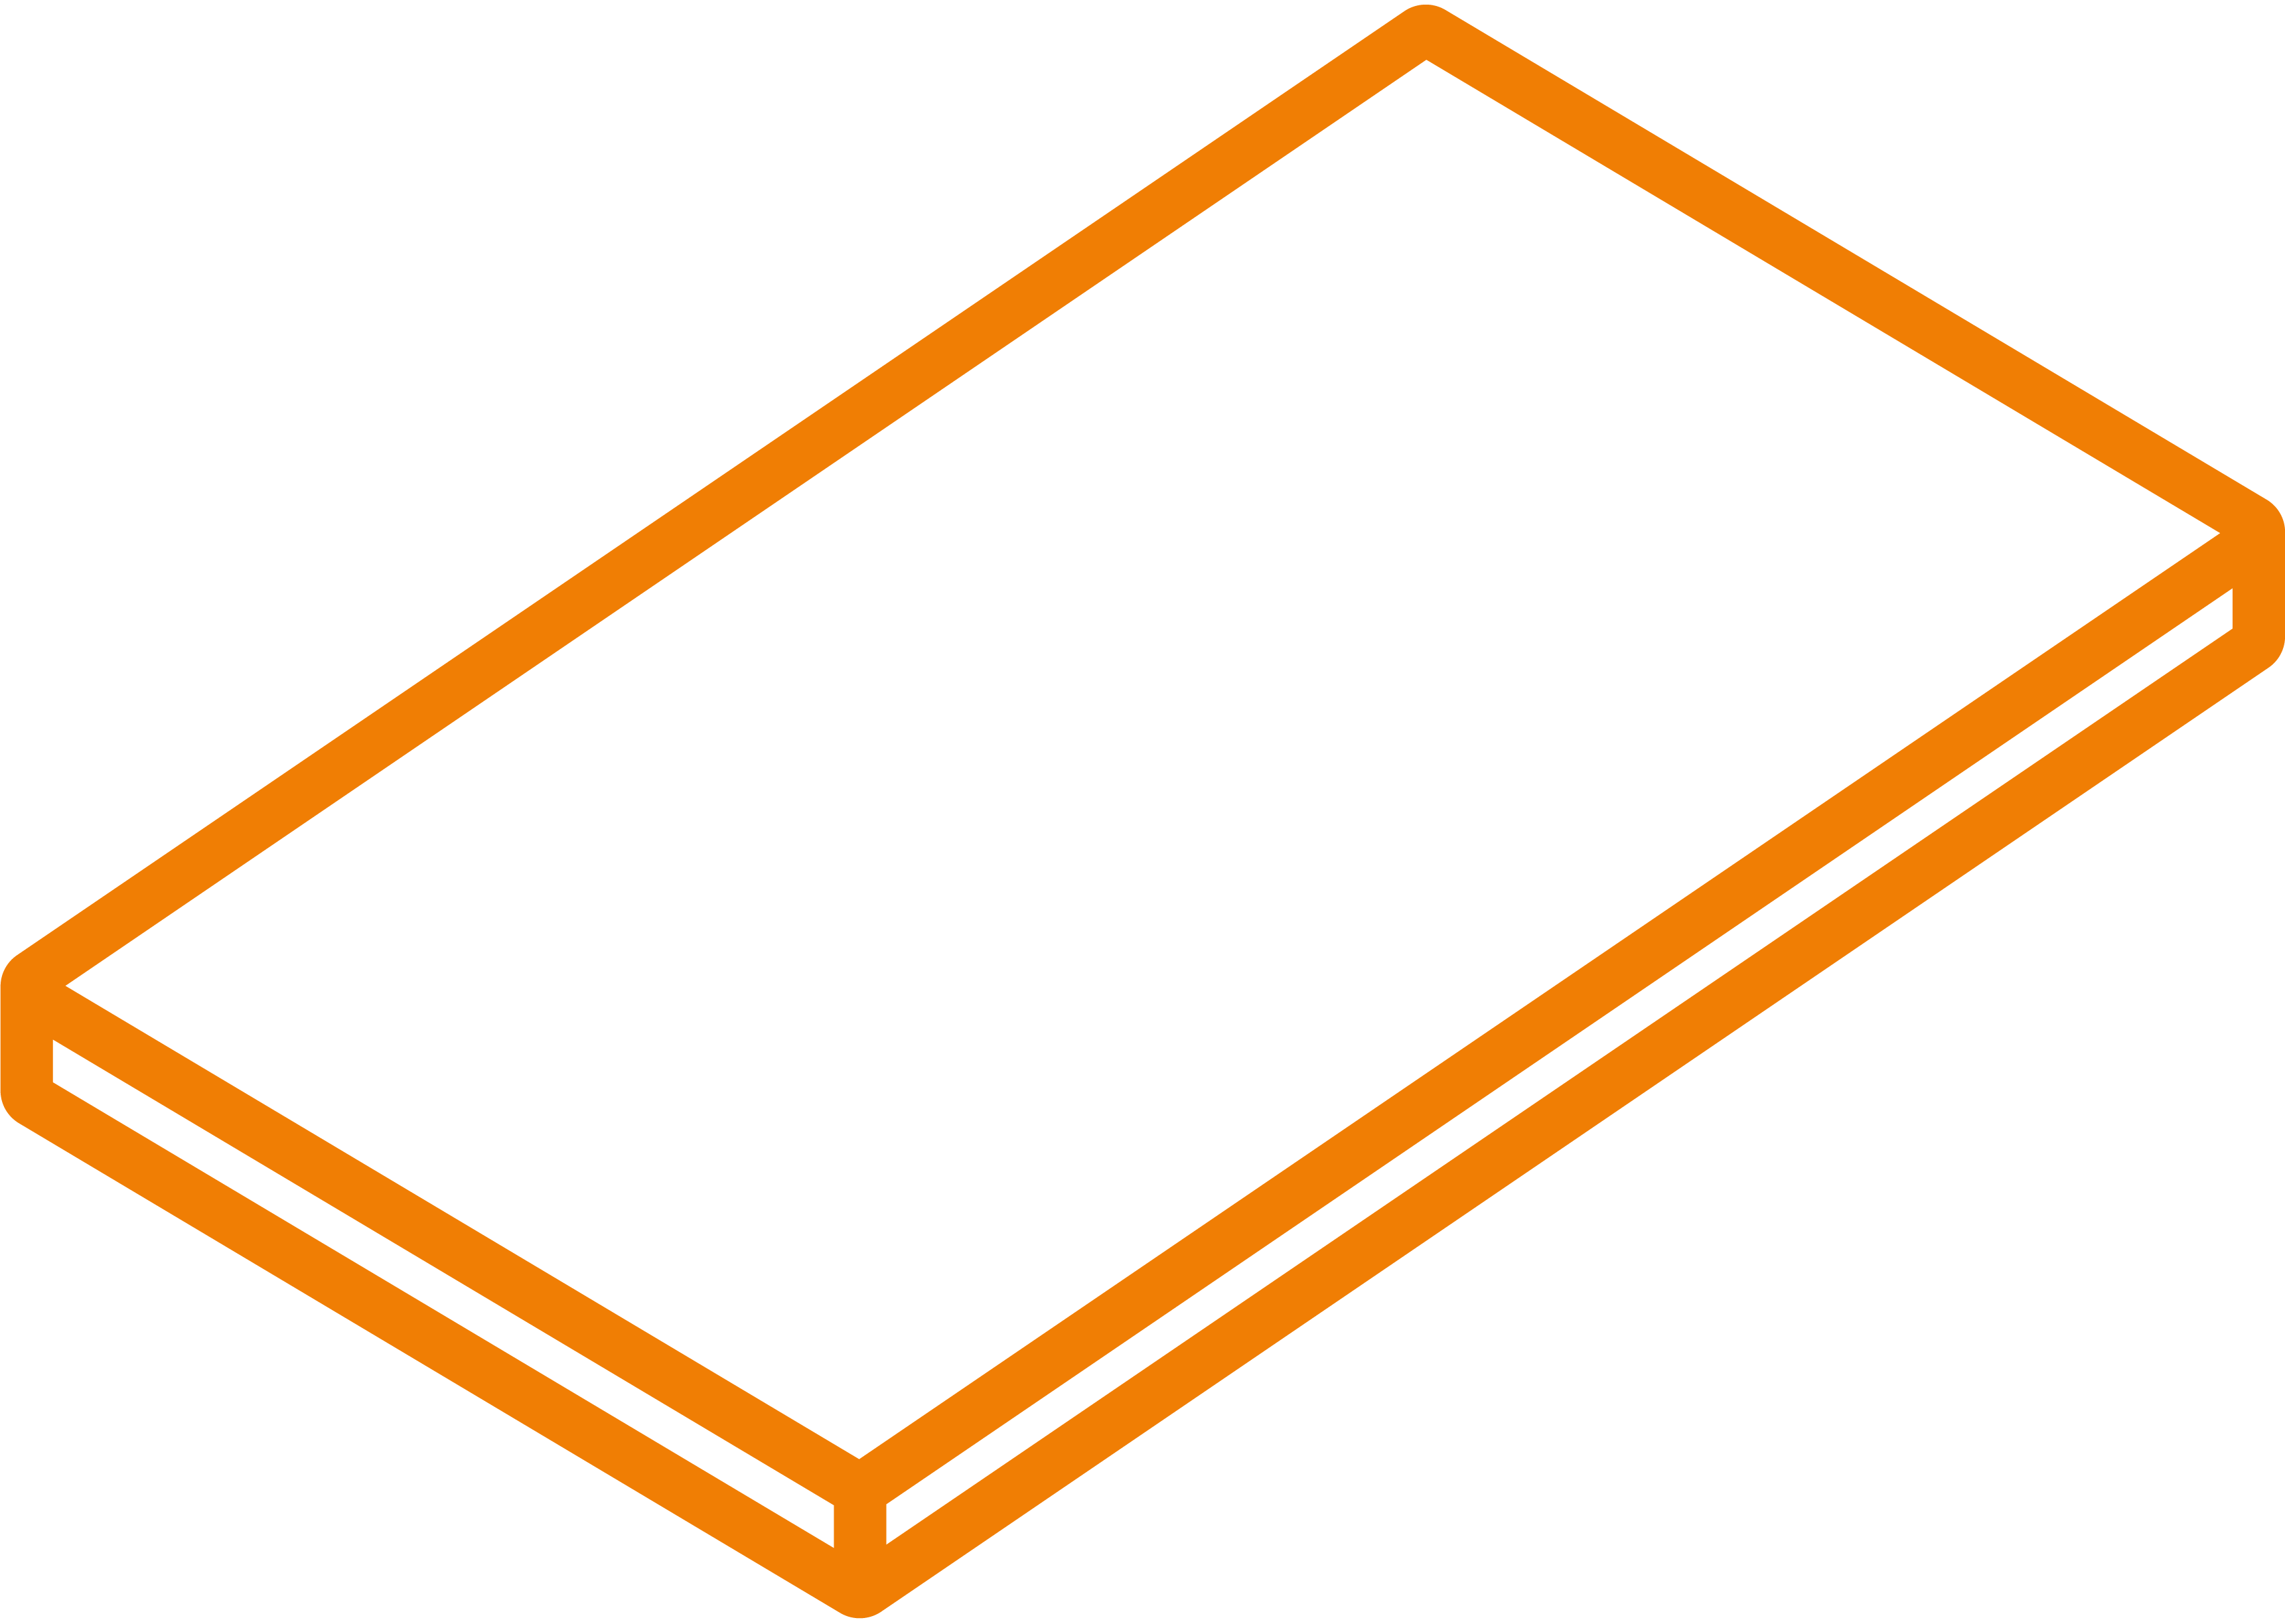 platten icon